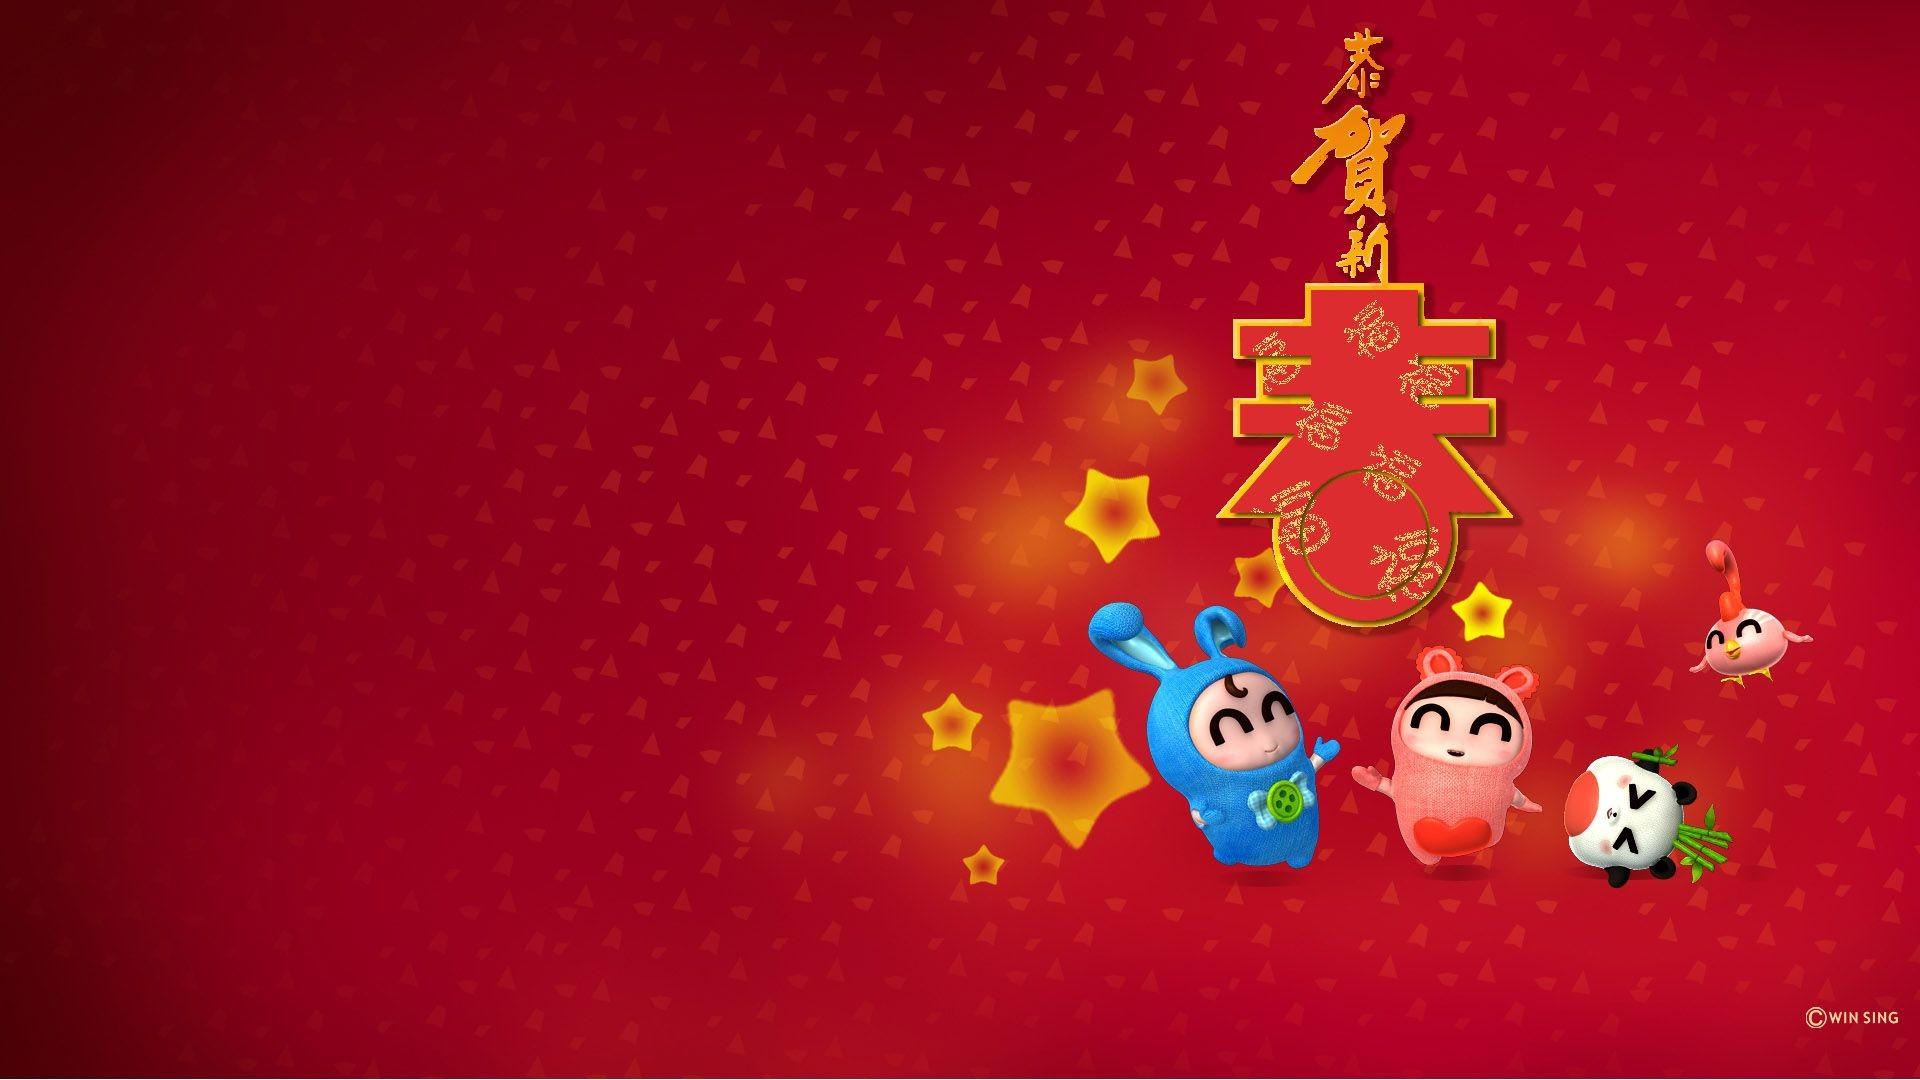 … chinese new year wallpaper hd wallpapersafari …